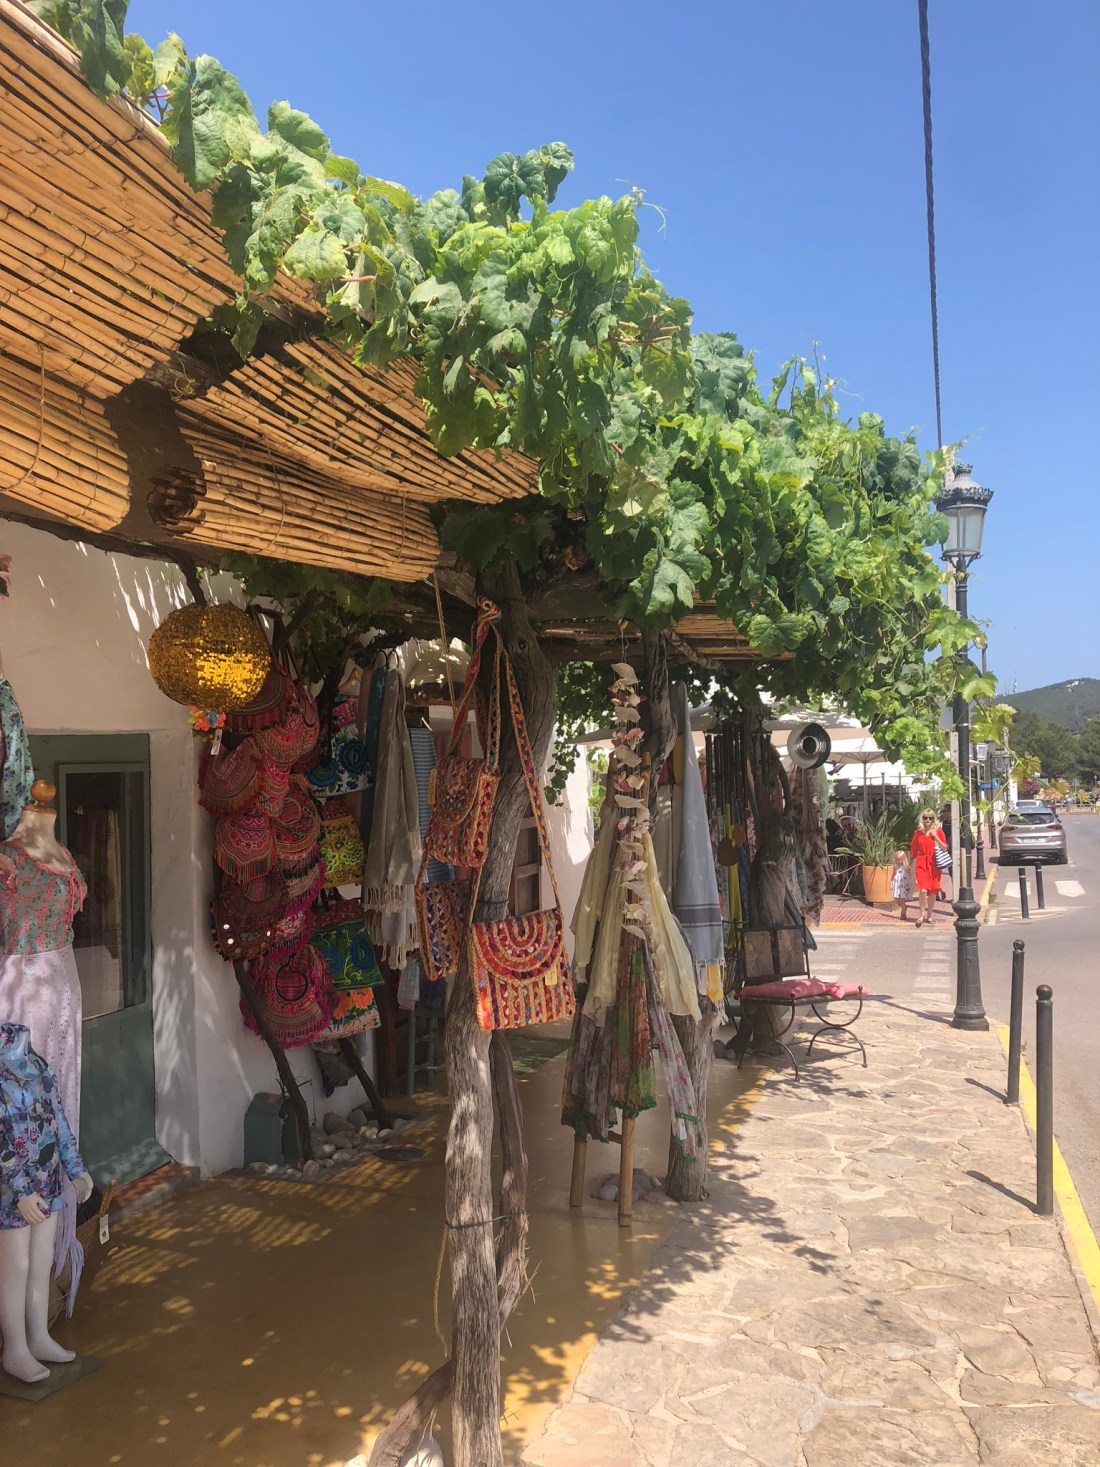 Best places to visit in Ibiza: Market in Santa Gertrudis, Ibiza